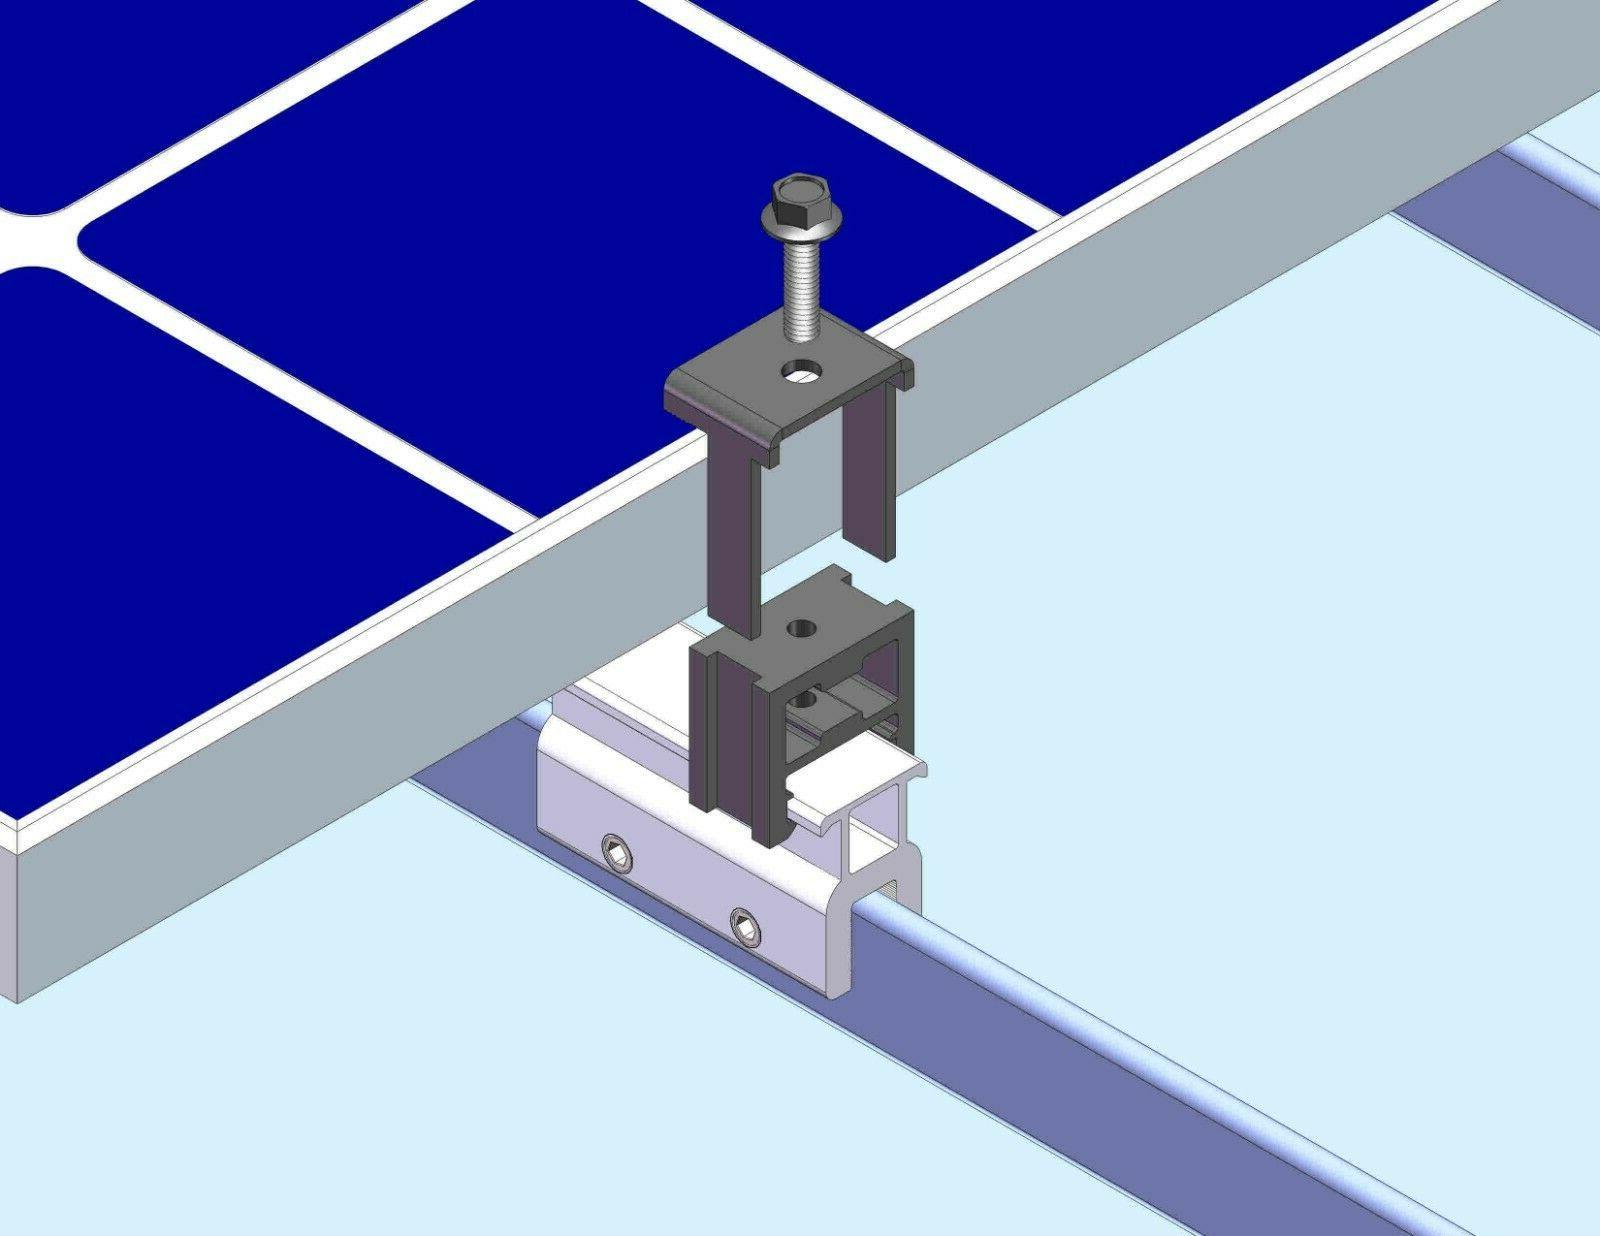 4 End Clamp Standing Seam Metal Panel Module Mounting Racking Kits